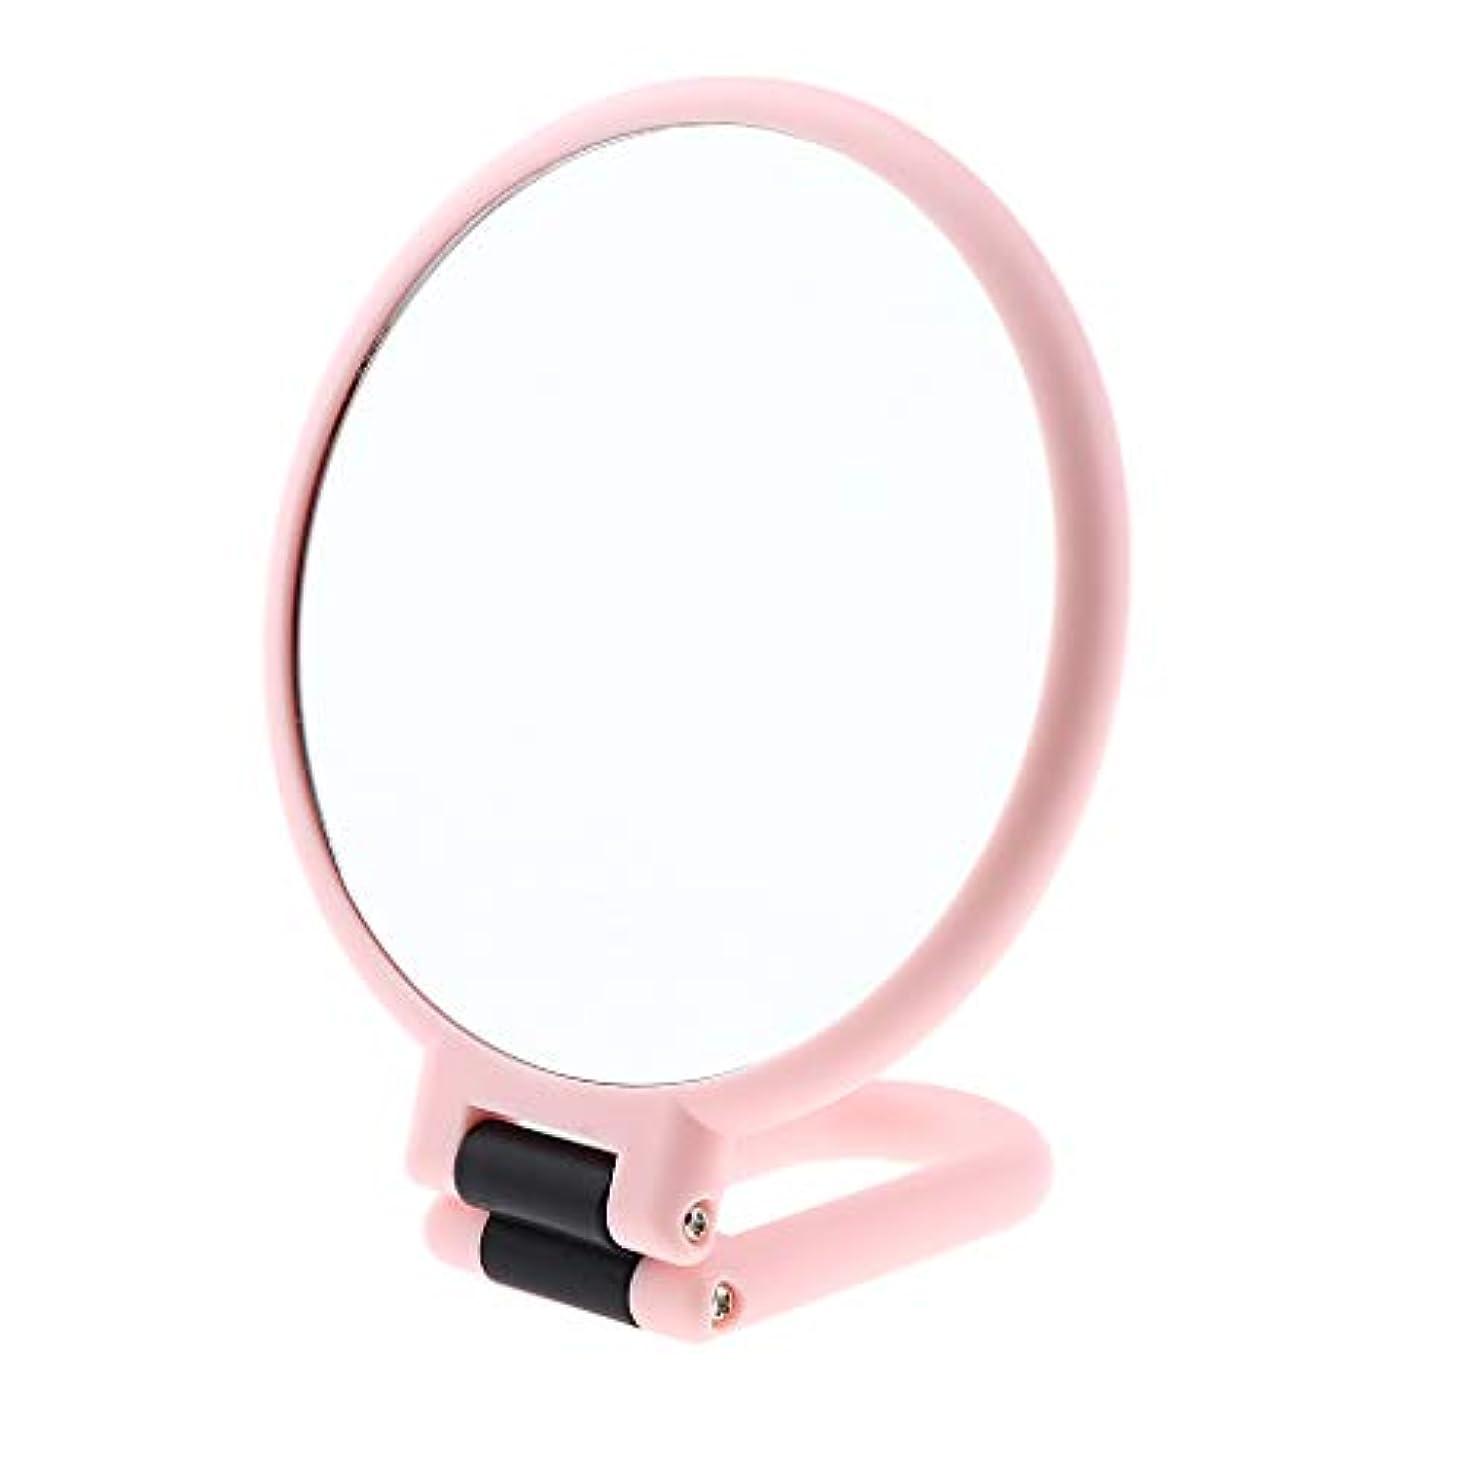 Sharplace 化粧鏡 スタンド 卓上 メイクミラー 拡大鏡 両面鏡 折りたたみ 2タイプ選べ - 10倍